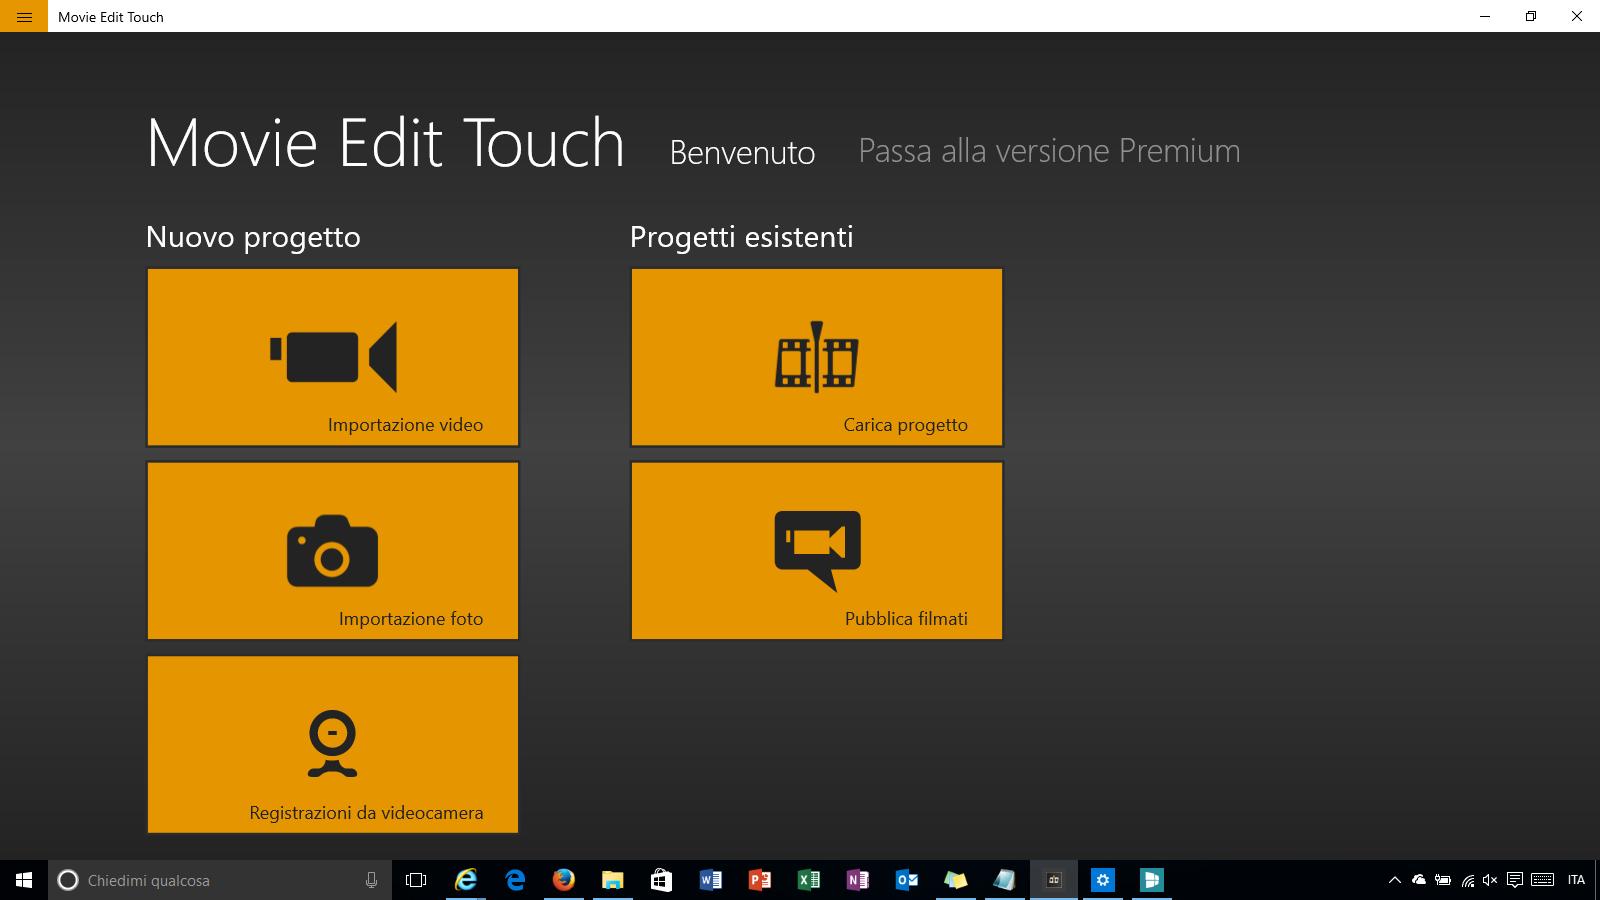 Movie Edit Touch, un'app di video-editing per Tablet e PC Windows 10 ...: www.windowsblogitalia.com/2015/09/movie-edit-touch-unapp-di-video...